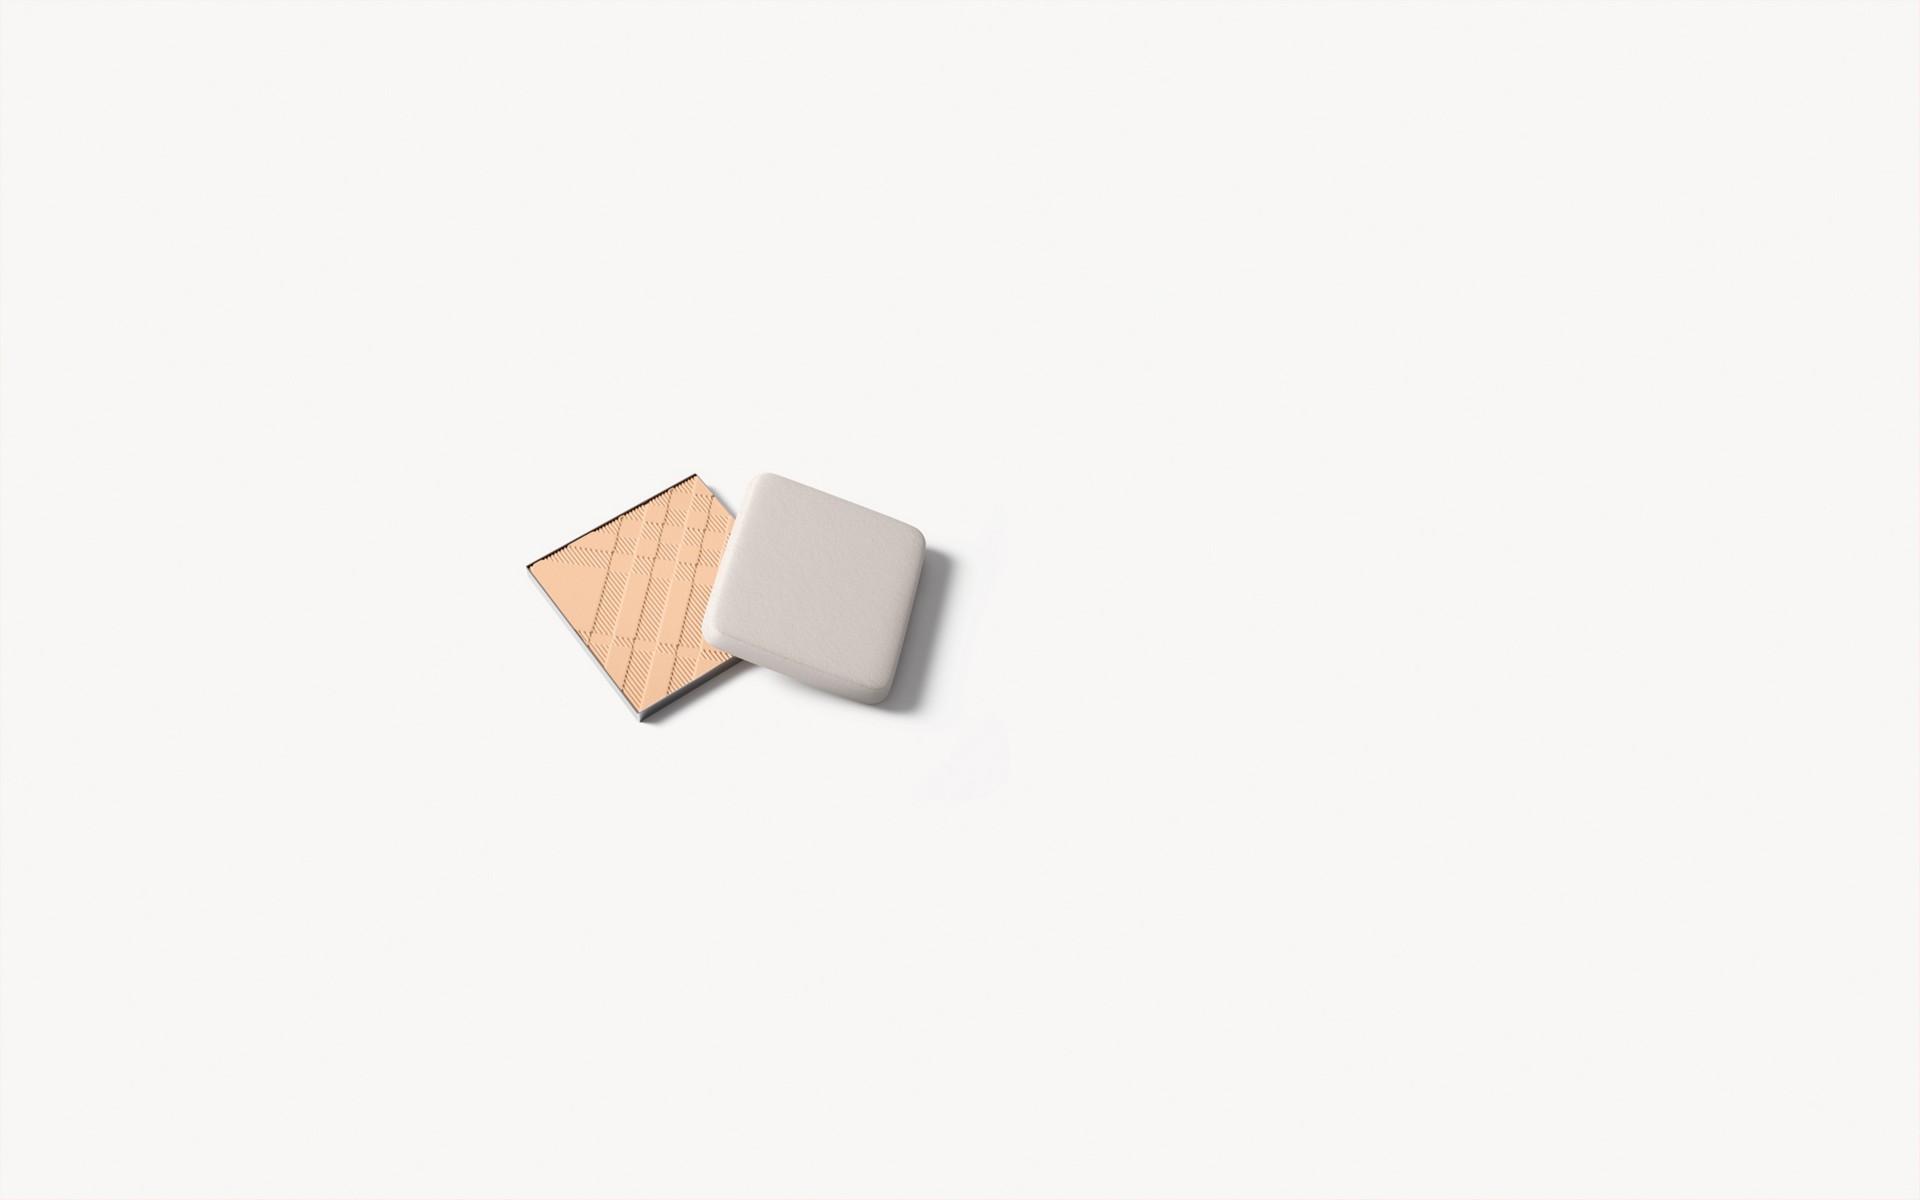 Bright Glow Compact SPF 25 PA +++ Refill – Ochre Nude No.12 - gallery image 3